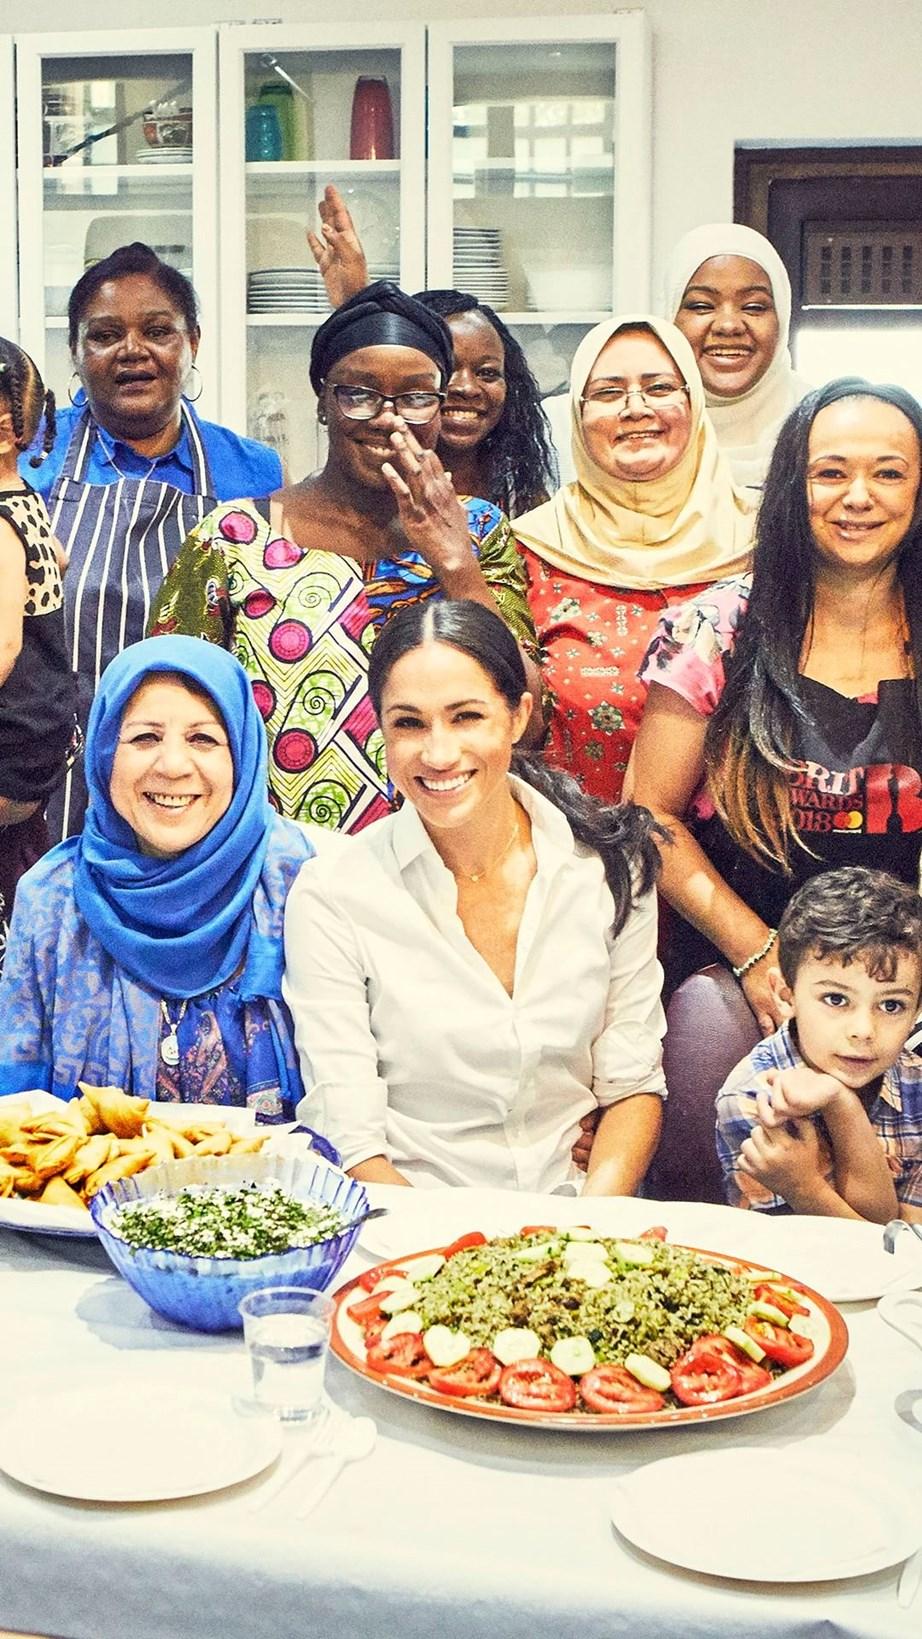 "Meghan, Duchess of Sussex, is supporting a community kitchen cookbook named Together. *Image: Twitter* / [*@KensingtonRoyal*](https://twitter.com/KensingtonRoyal/status/1041614862978297858/photo/1|target=""_blank""|rel=""nofollow"")"